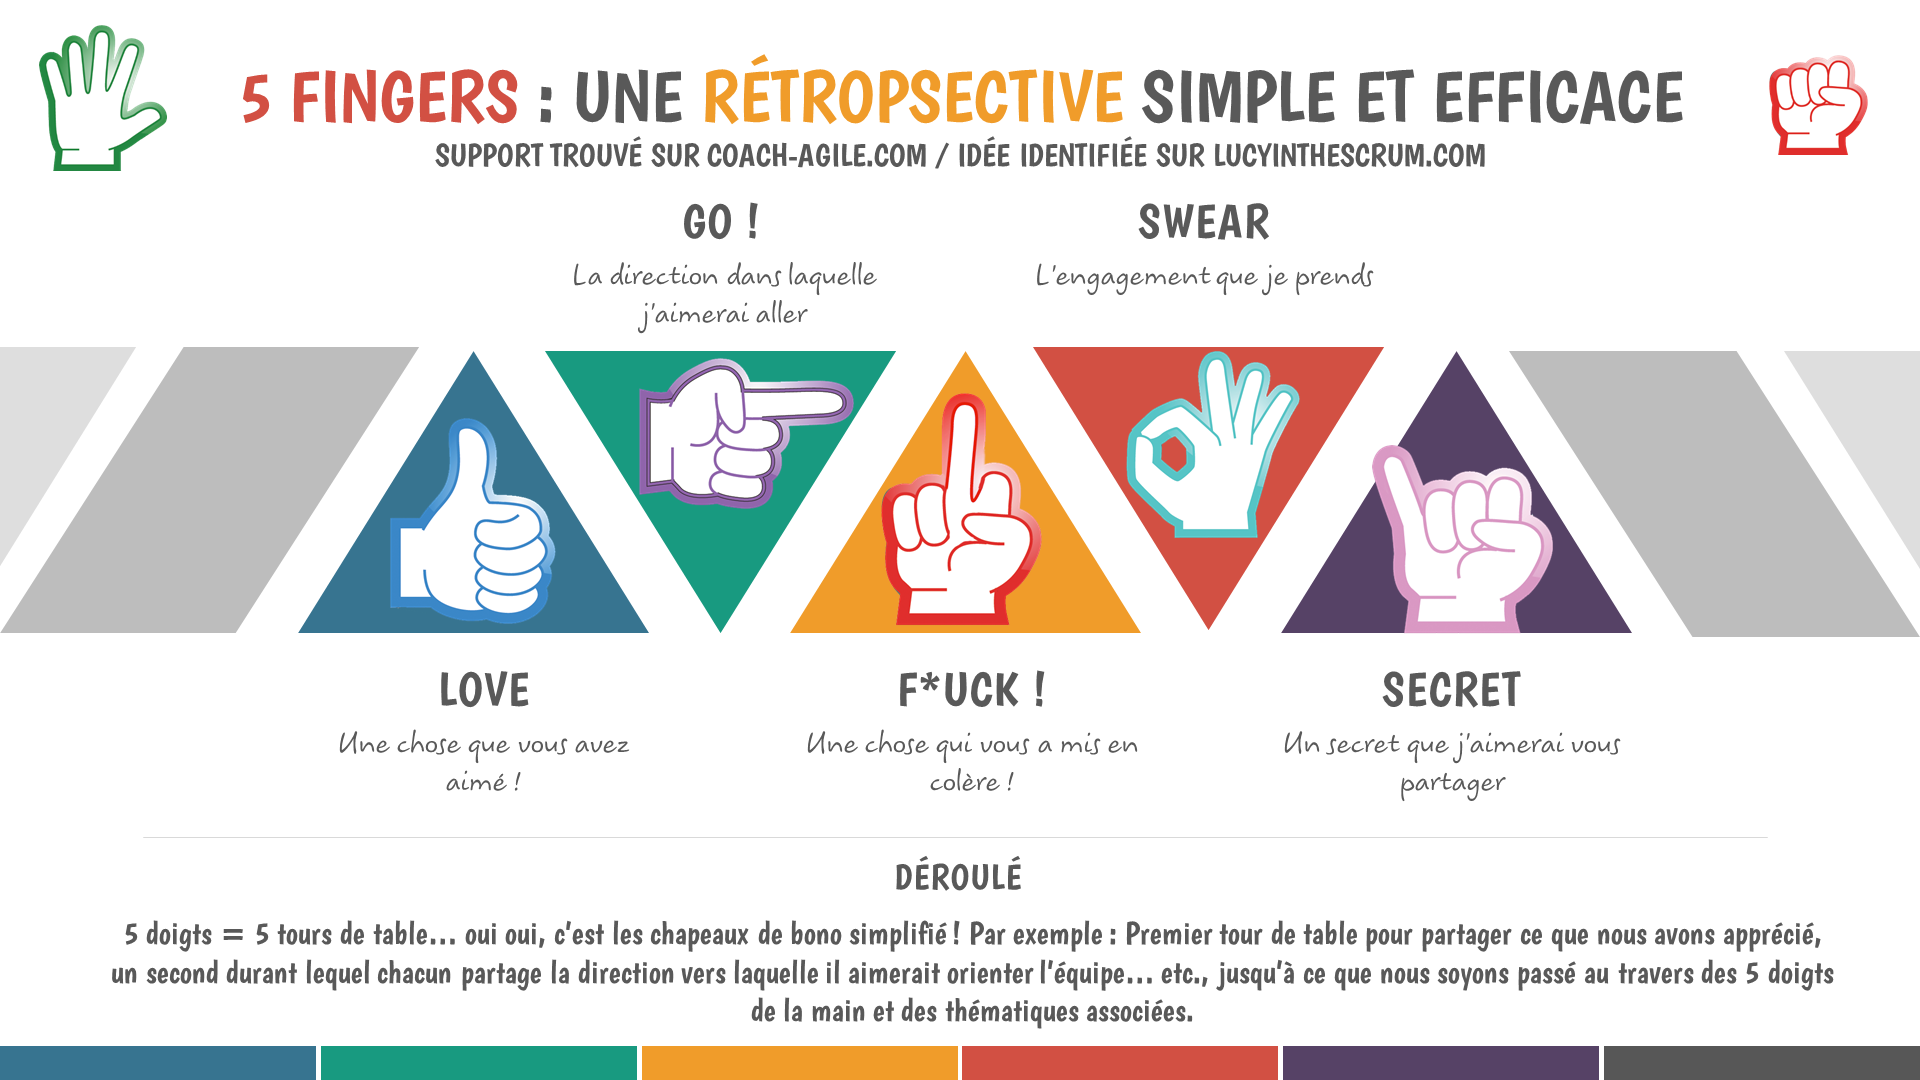 LA RETROSPECTIVE DES 5 DOIGTS